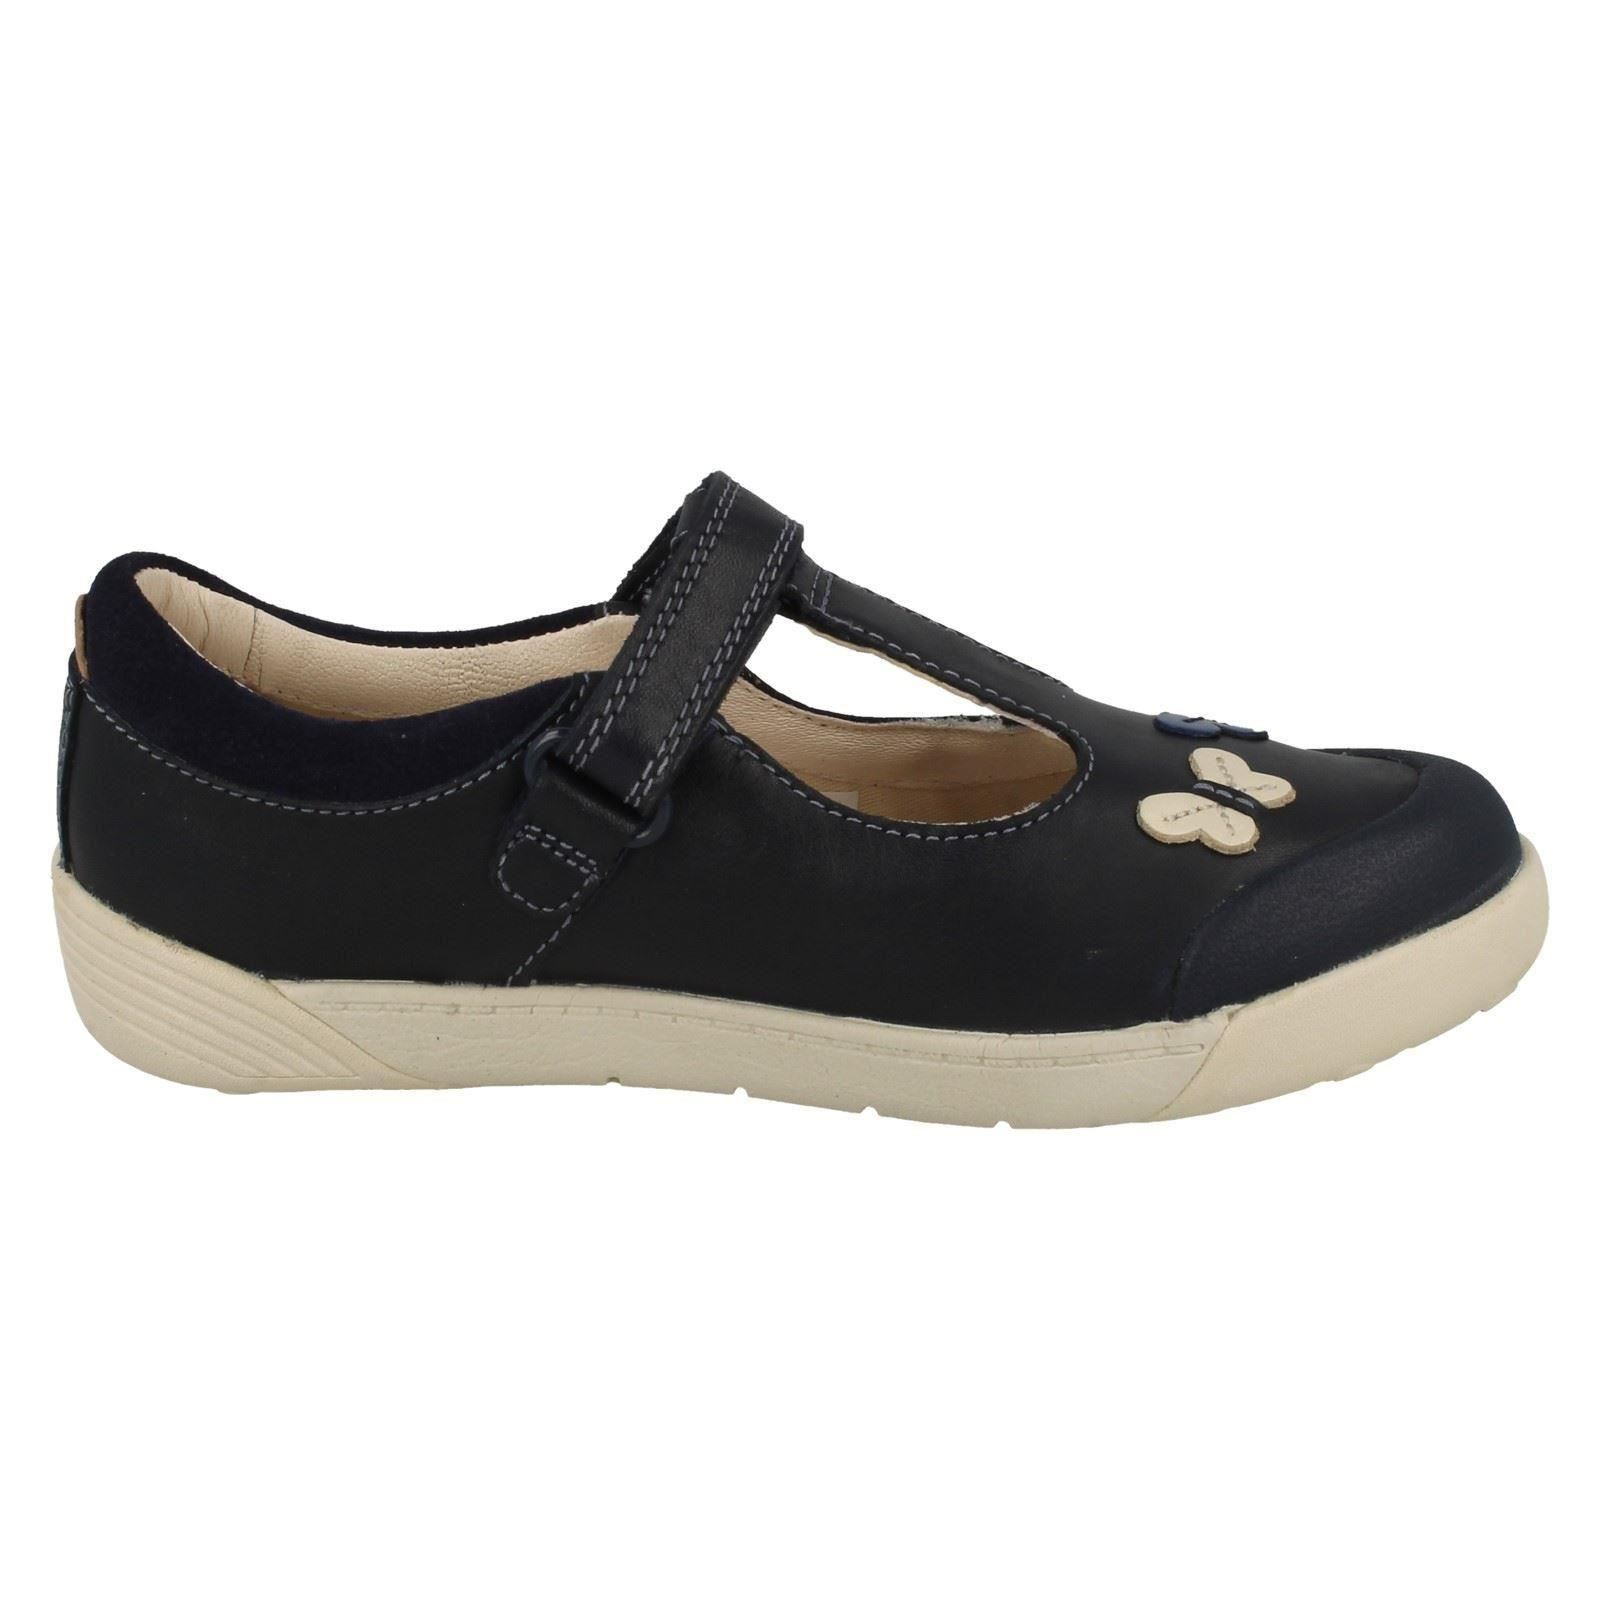 Chicas Clarks Zapatos lilfolk Flo T-Bar